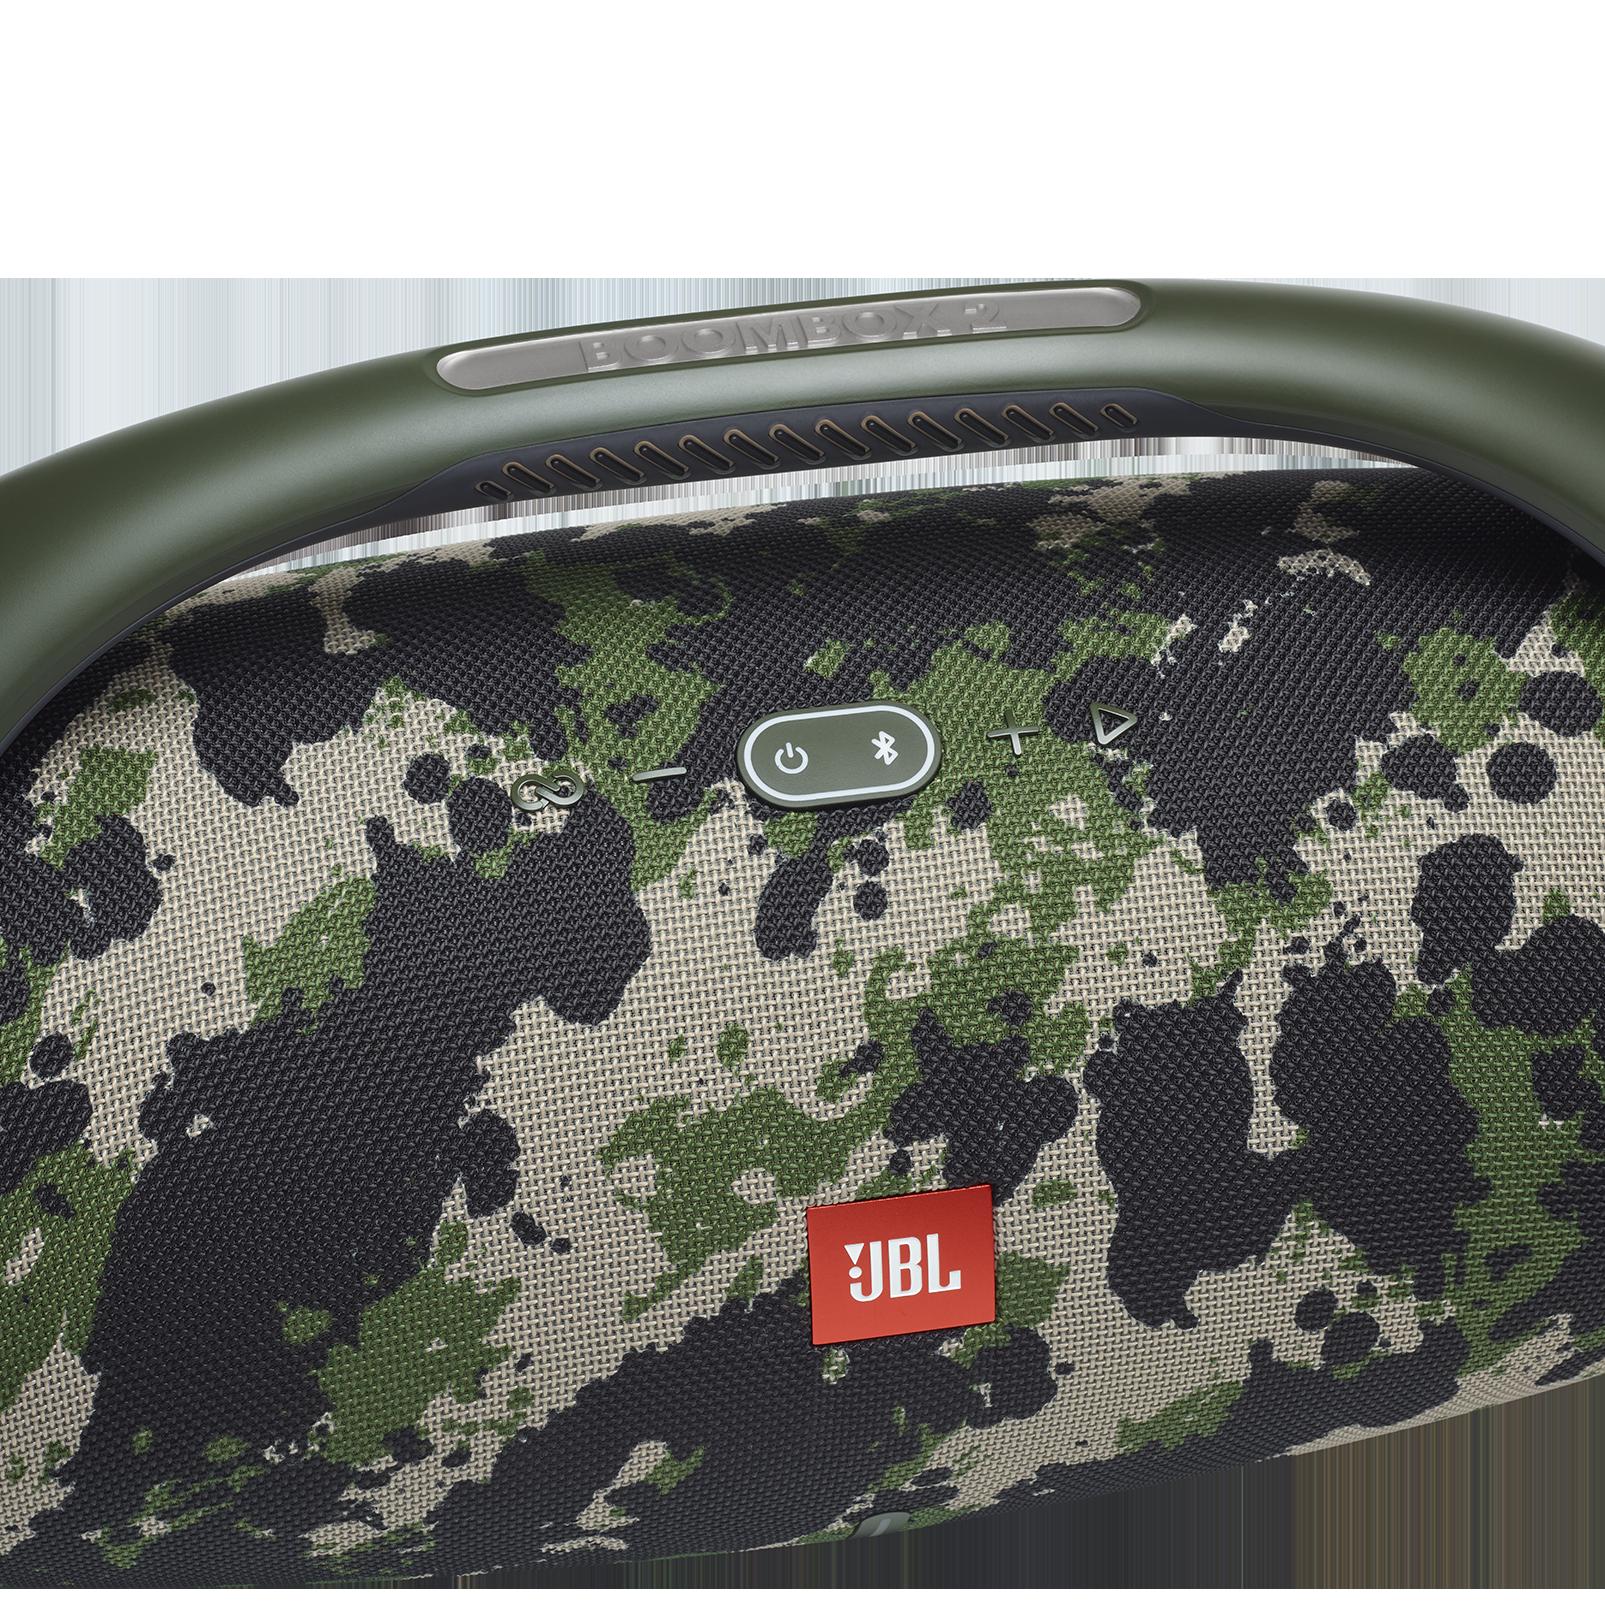 JBL Boombox 2 - Squad - Portable Bluetooth Speaker - Detailshot 1